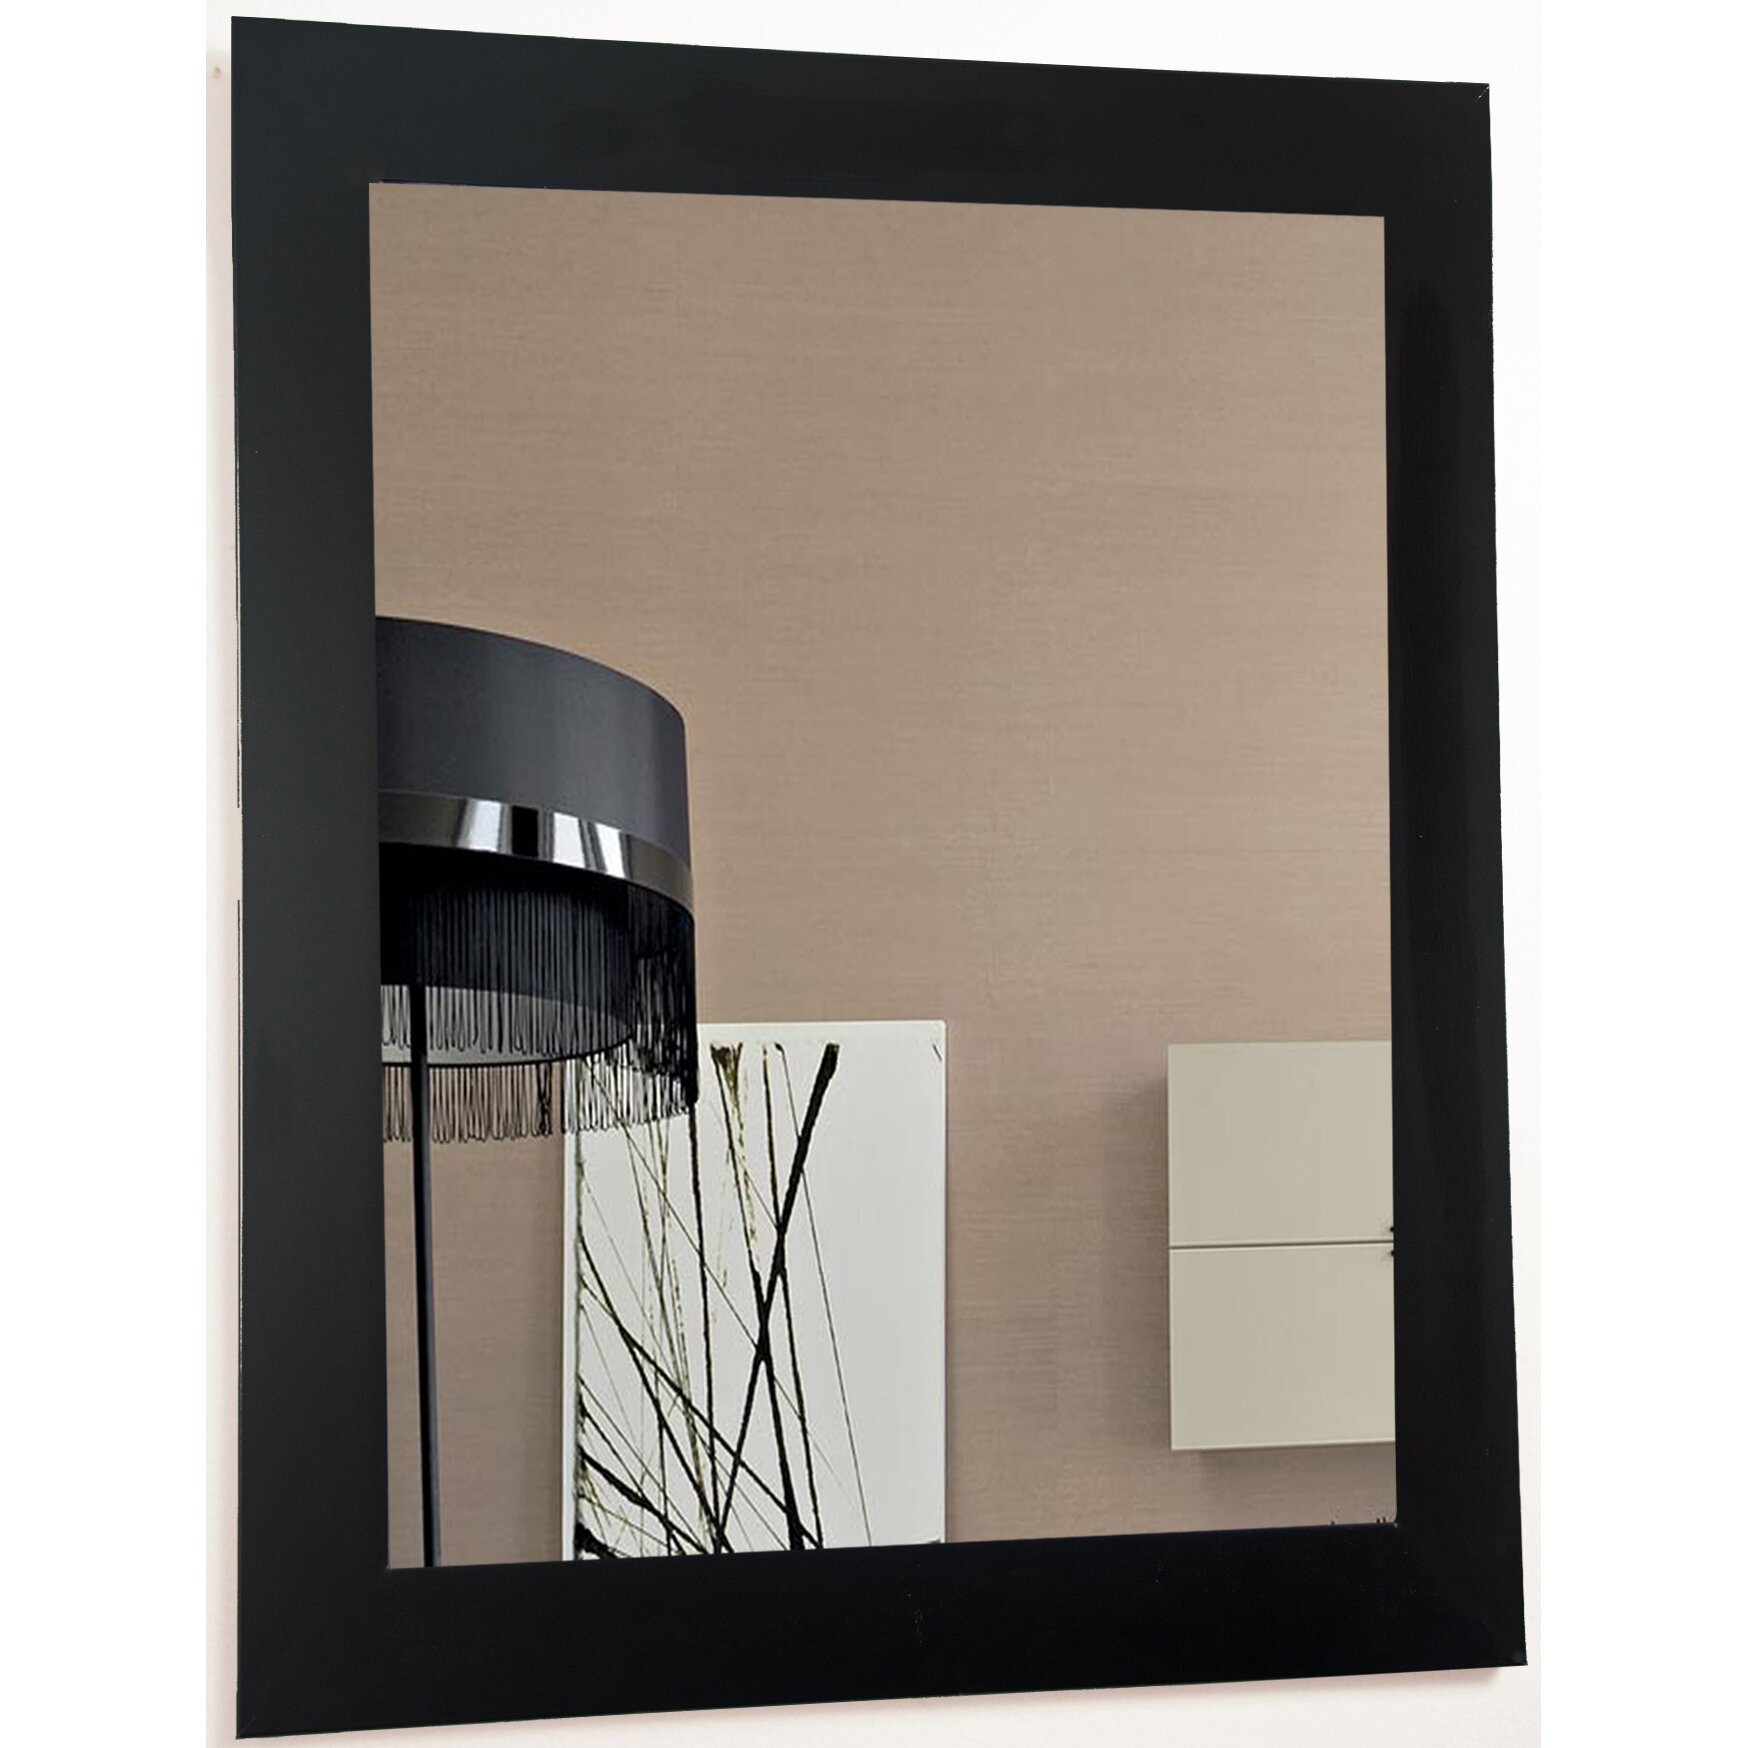 brayden studio black and white designer wall mirror reviews. Black Bedroom Furniture Sets. Home Design Ideas